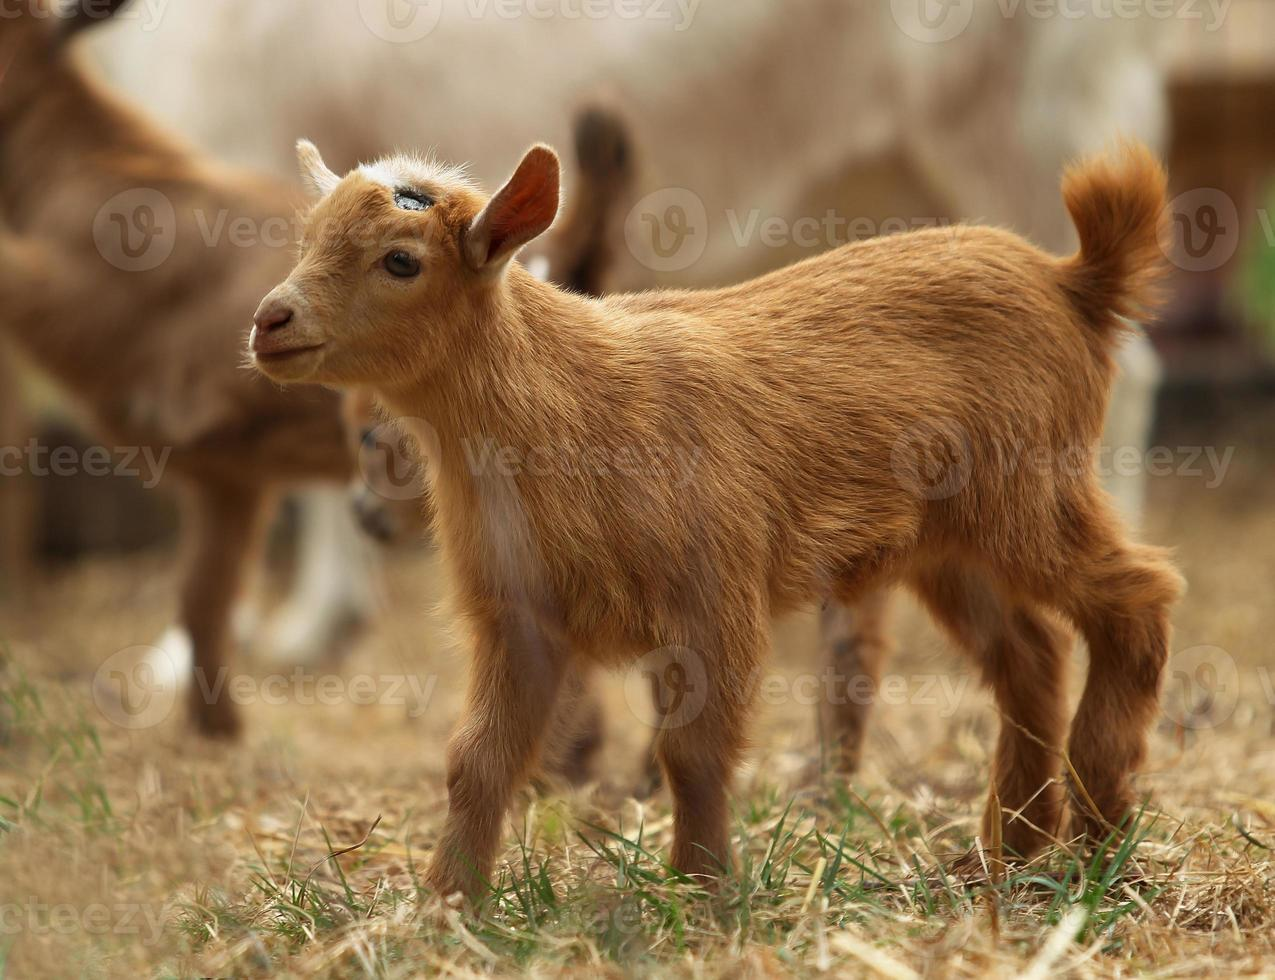 Baby Goat photo